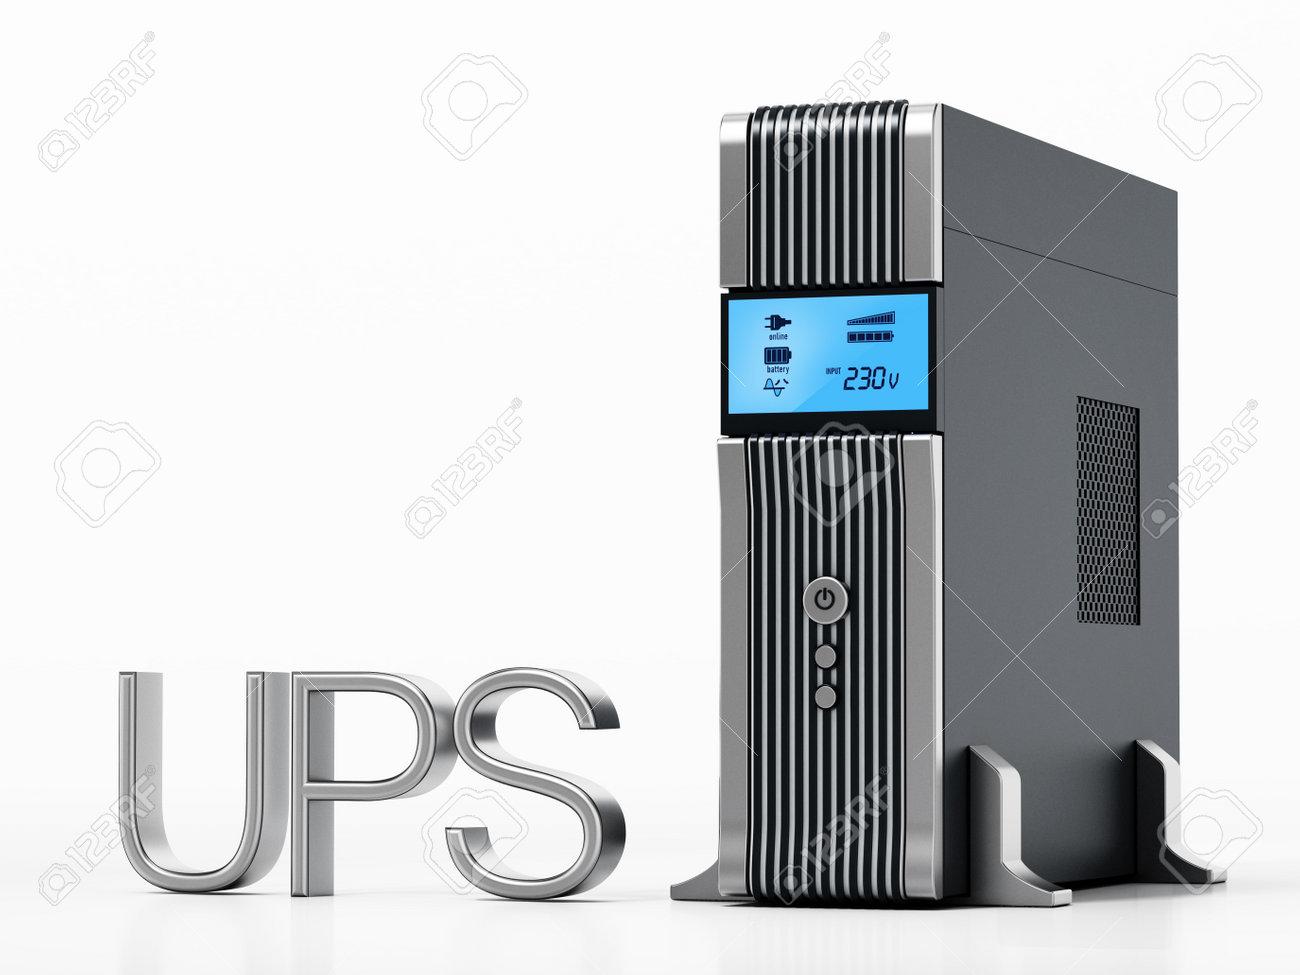 Uninterruptible power supply UPS isolated on white background. 3D illustration. - 173109663